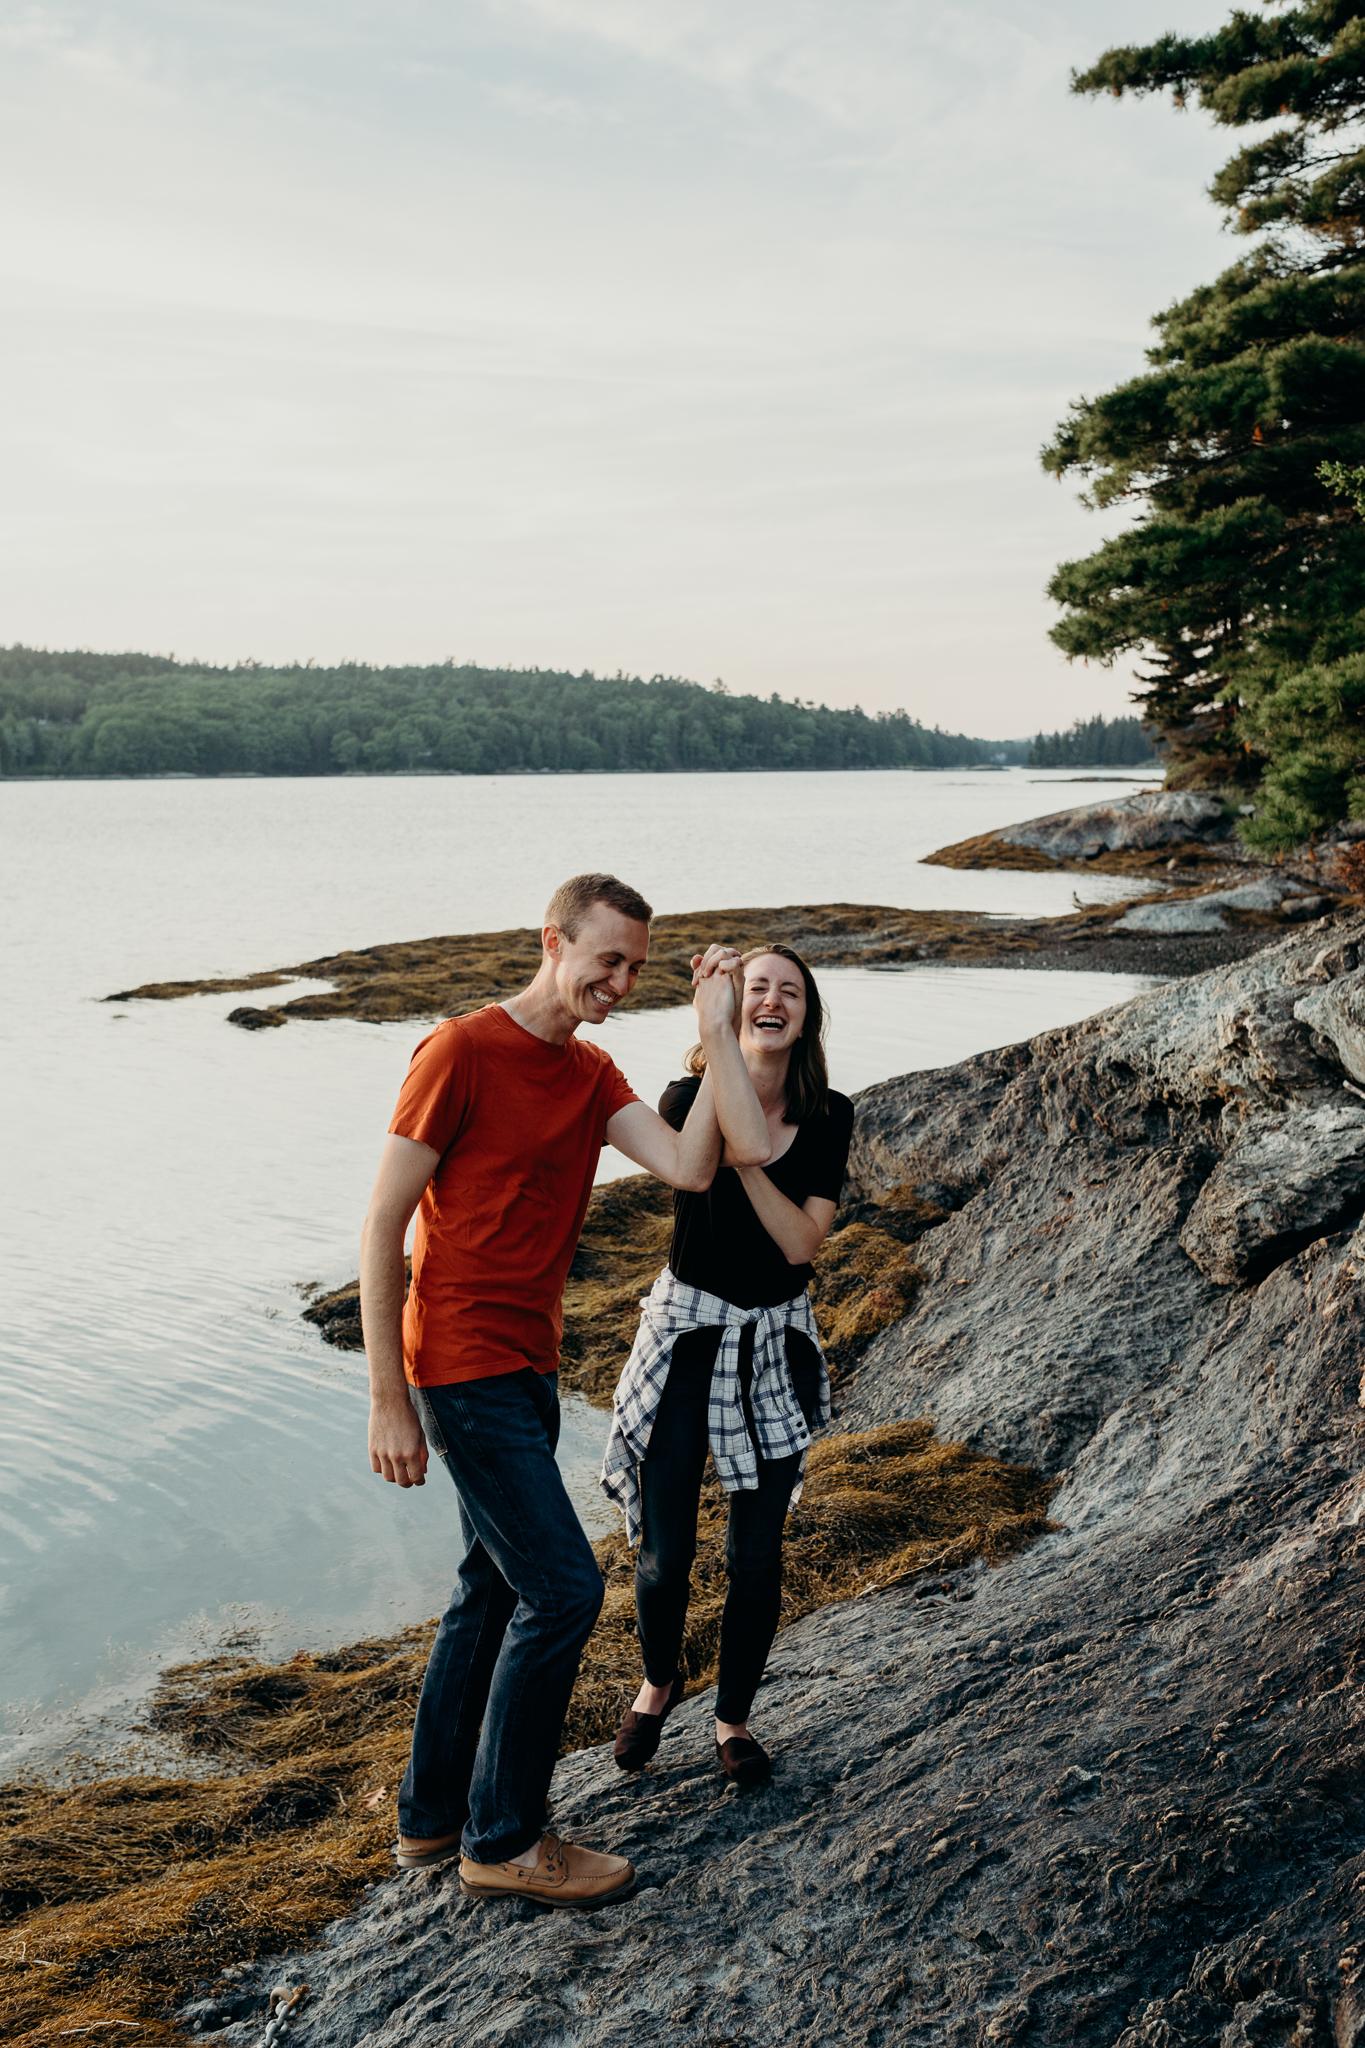 erinwheatco-2712 Anniversary Session on the Coast of Maine   Sarah & Dan